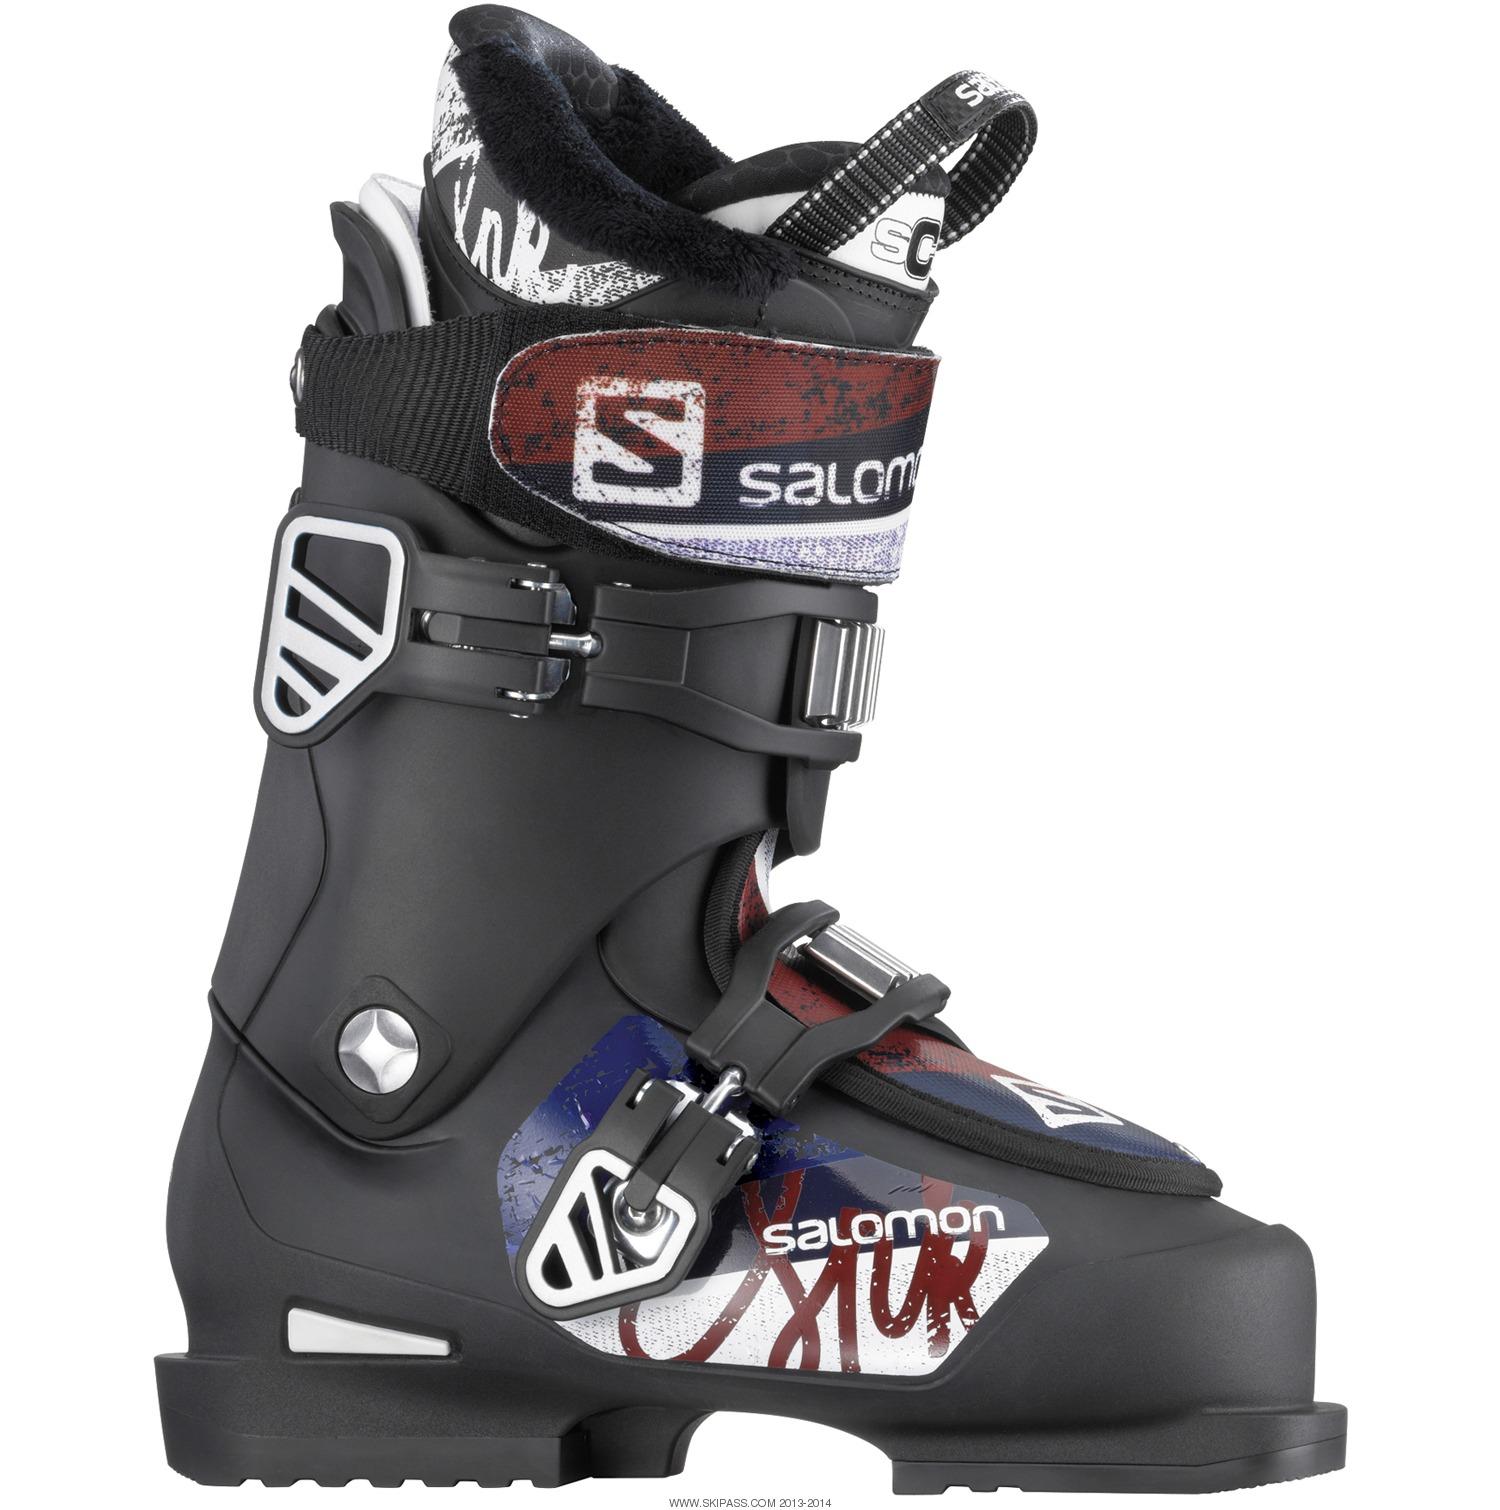 chaussure ski salomon freestyle,chaussures salomon